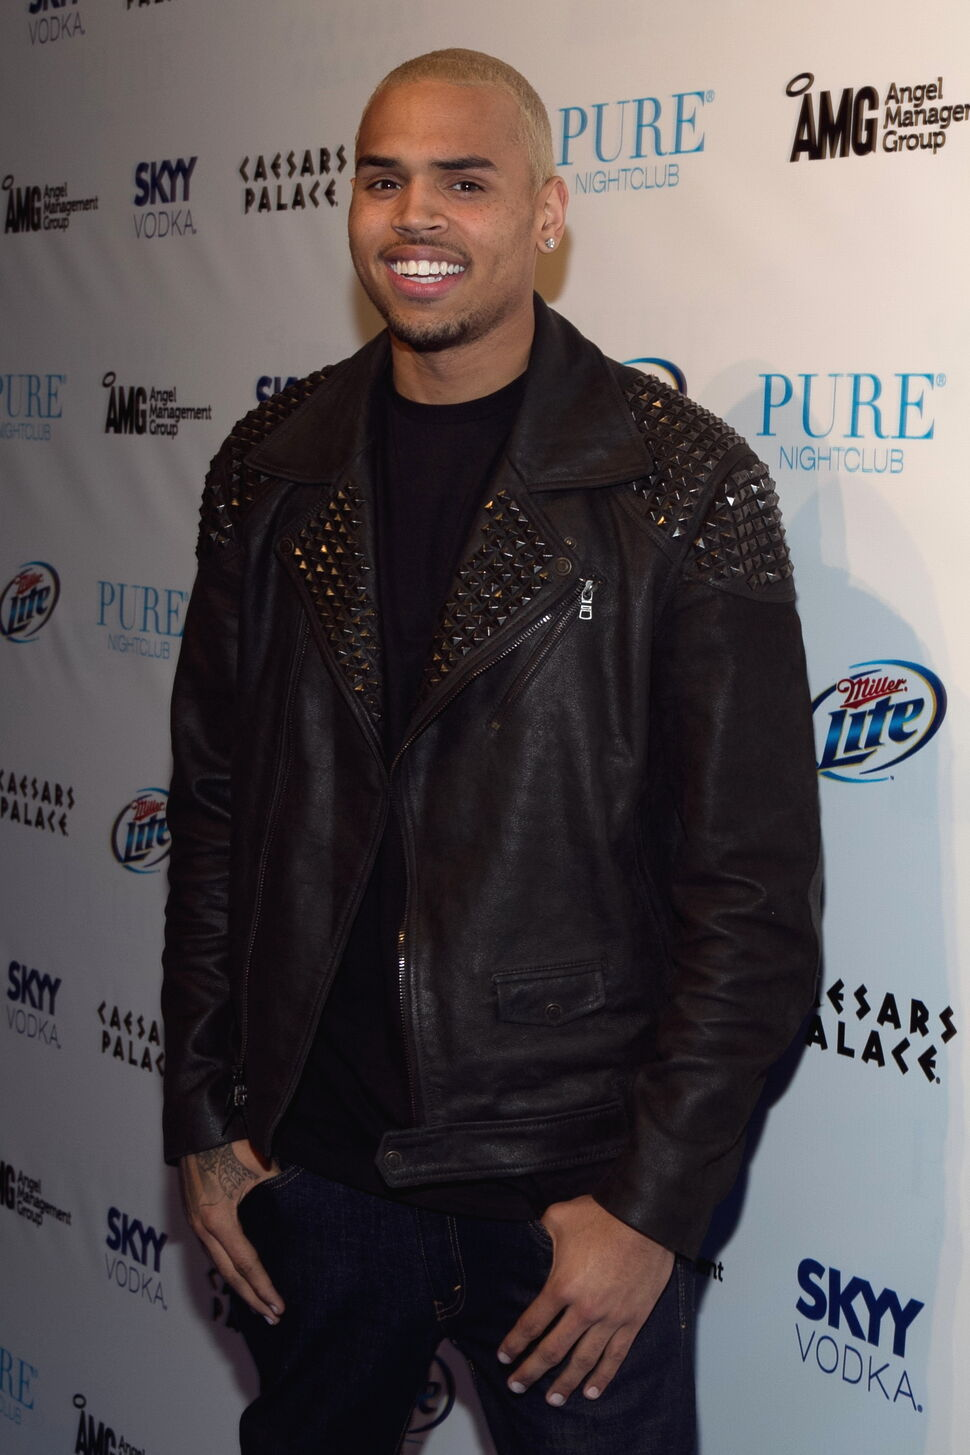 Крис Браун номинирован в шести номинациях на премии BET